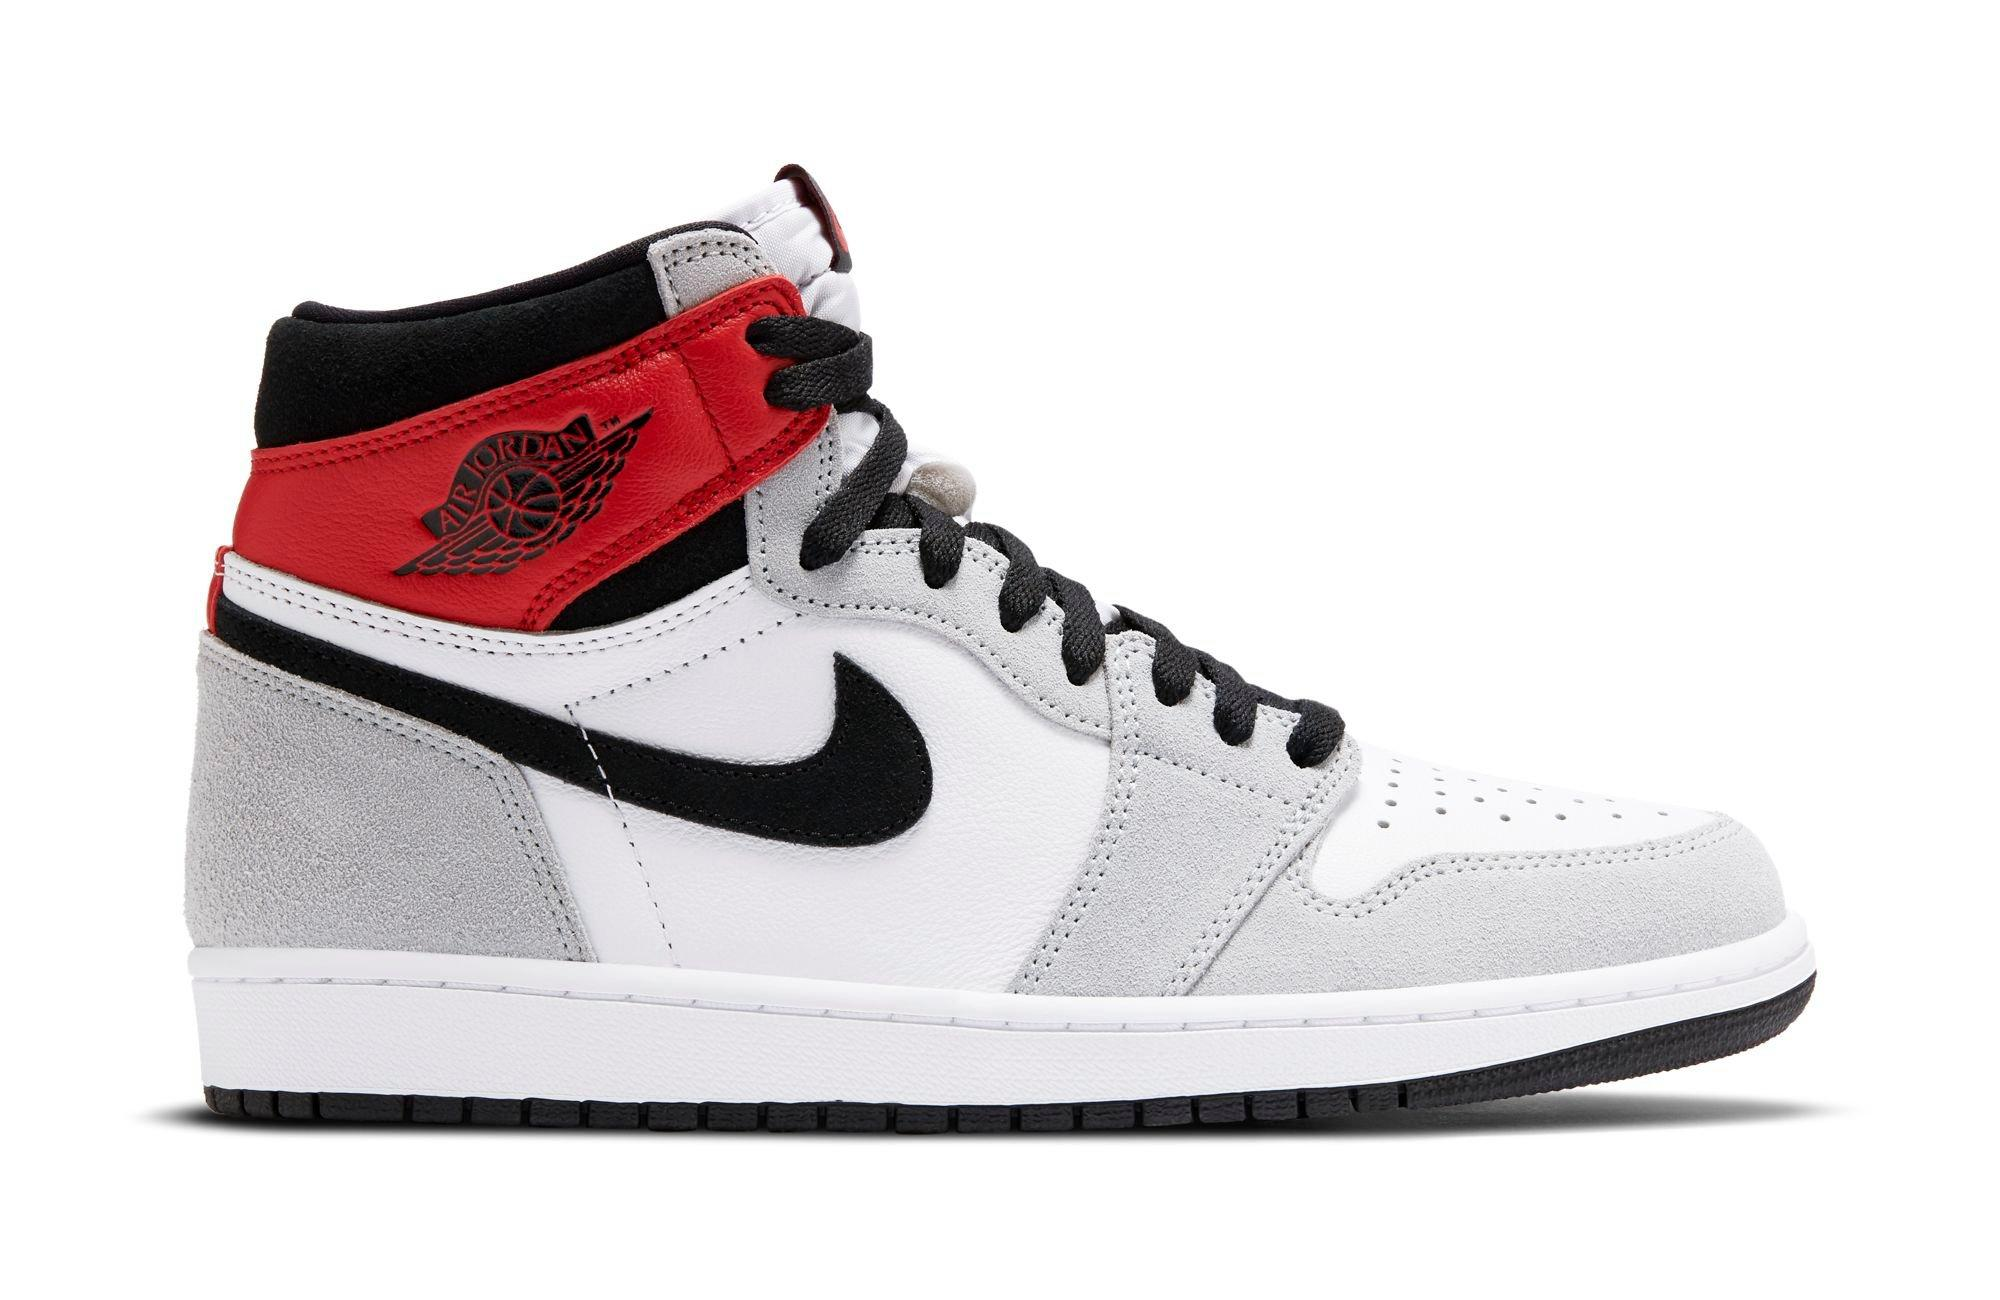 "Jordan 1 Retro High OG ""Light Smoke Grey"" White/Black/Light Smoke Grey Men's and Kids' Shoe"